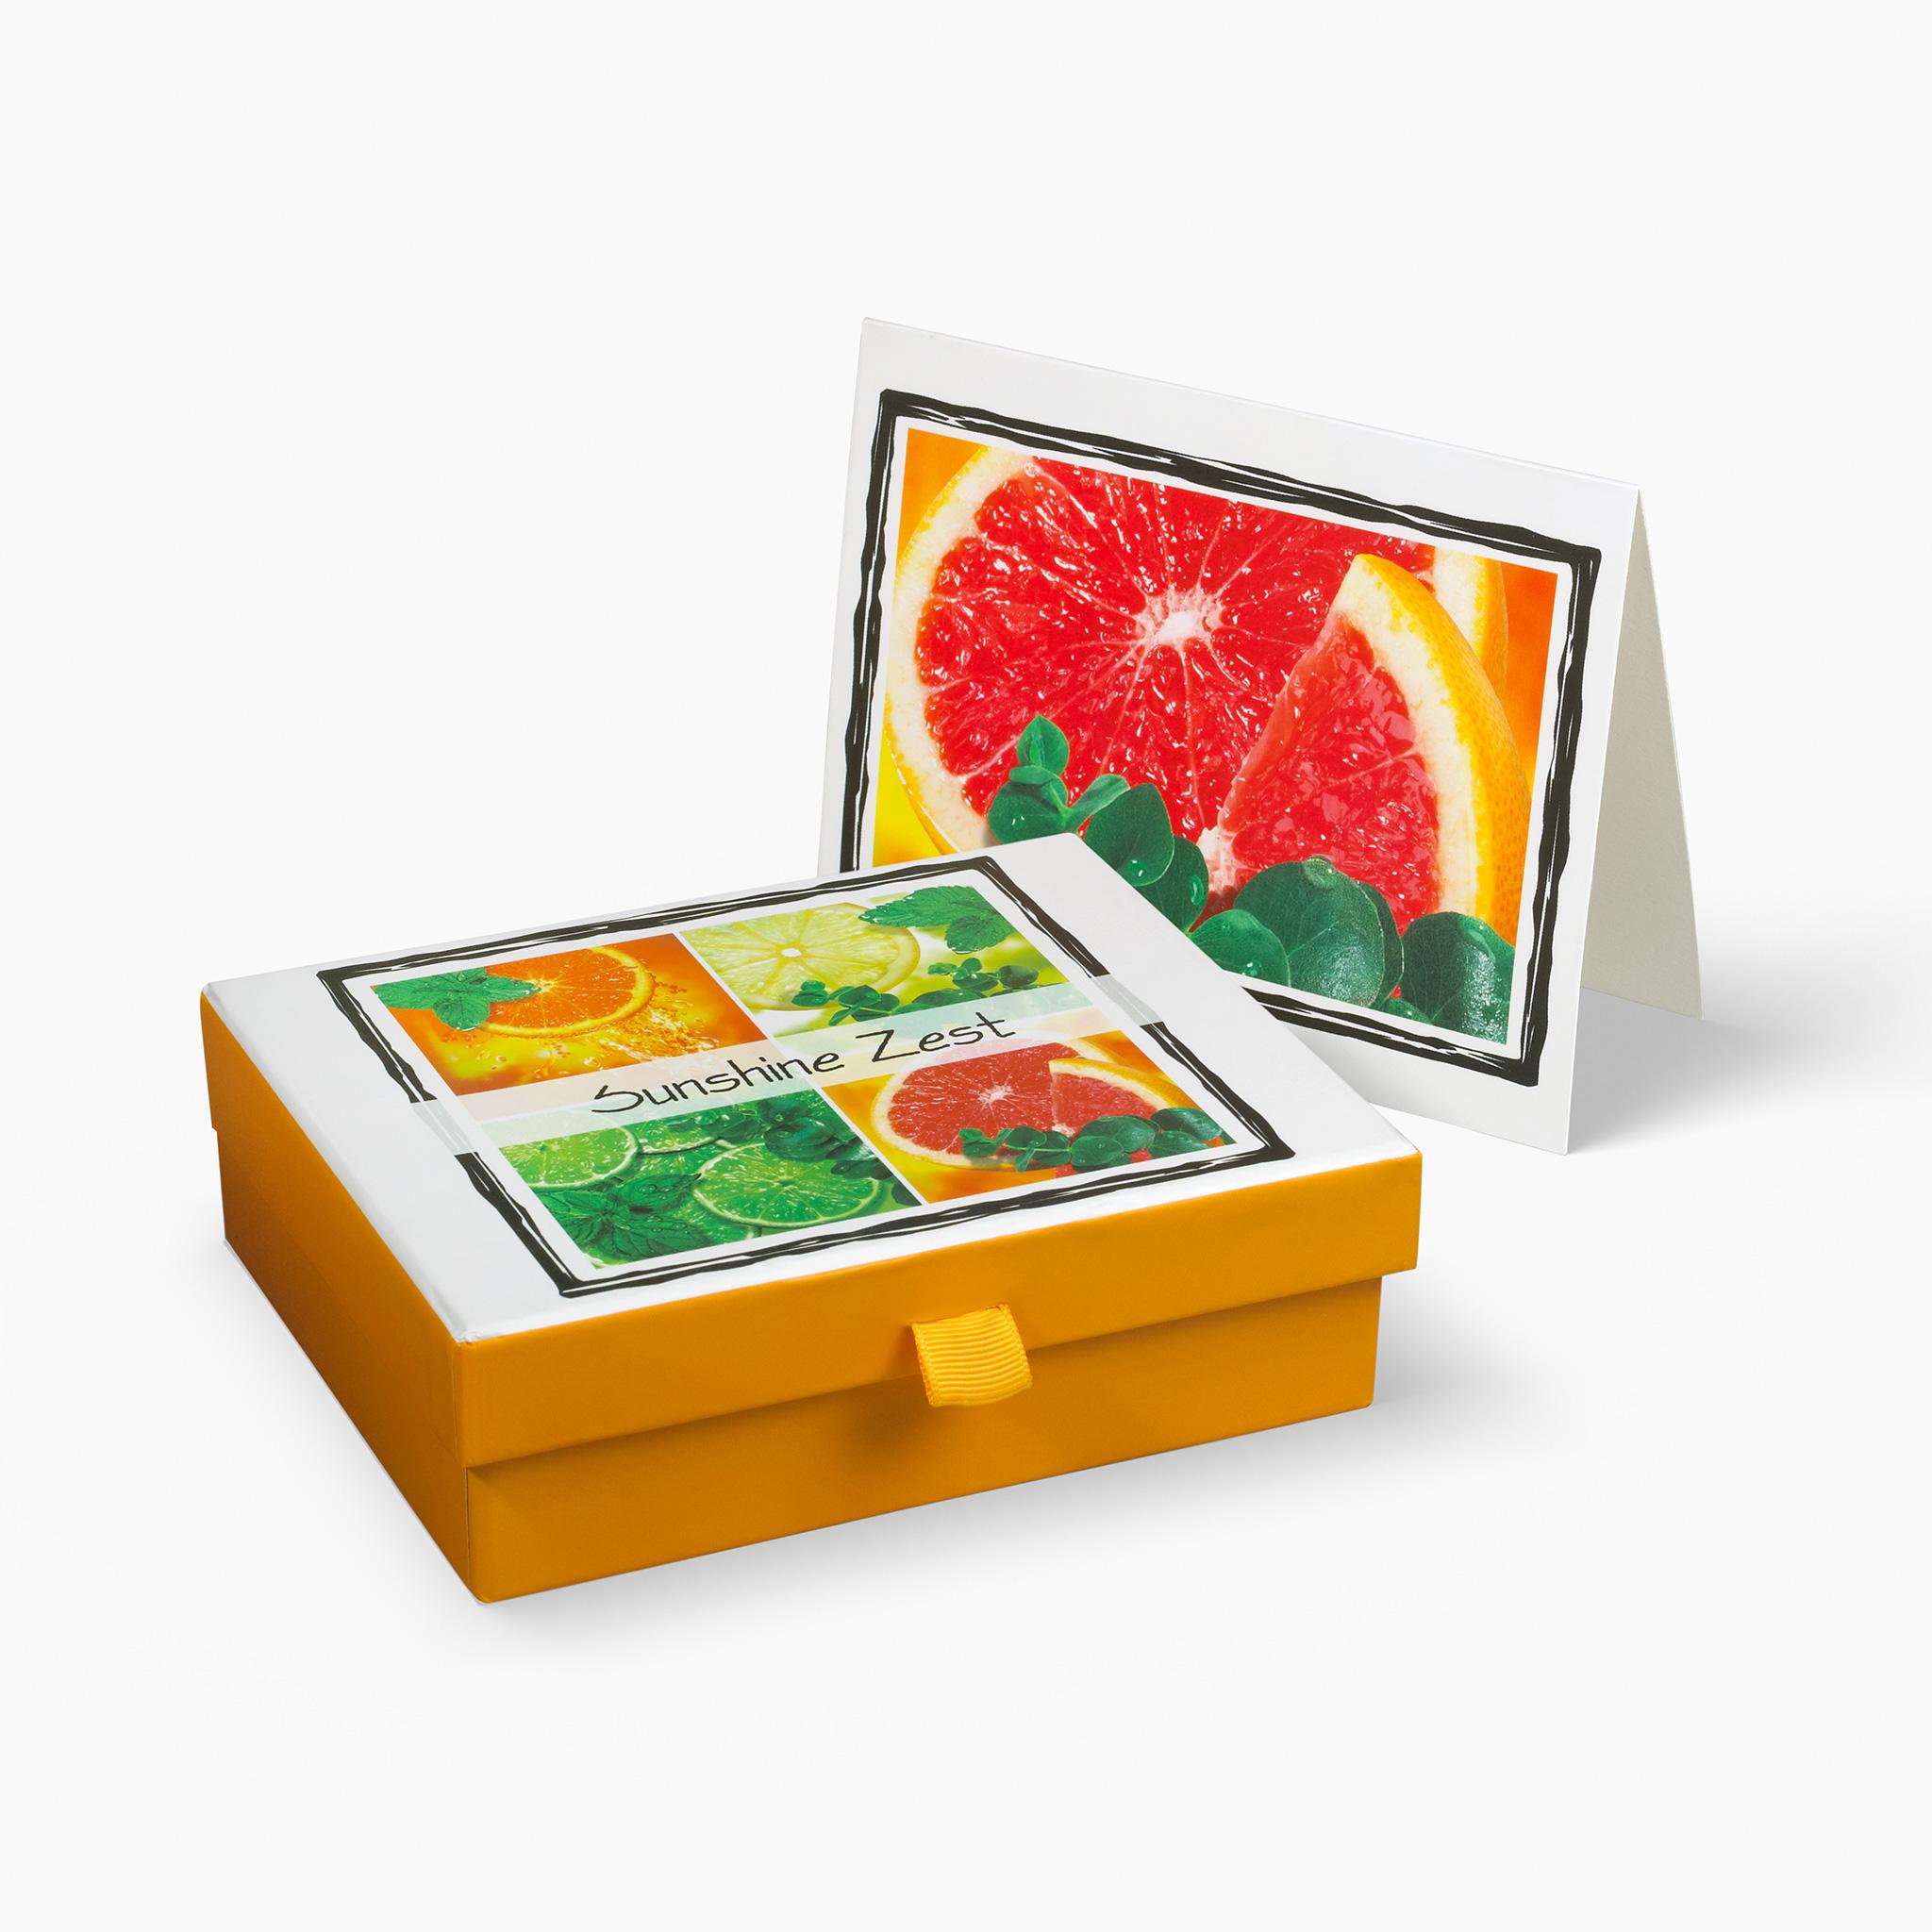 Nabila K's Sunshine Zest Card and Envelope Stationary with a box holding the cardss